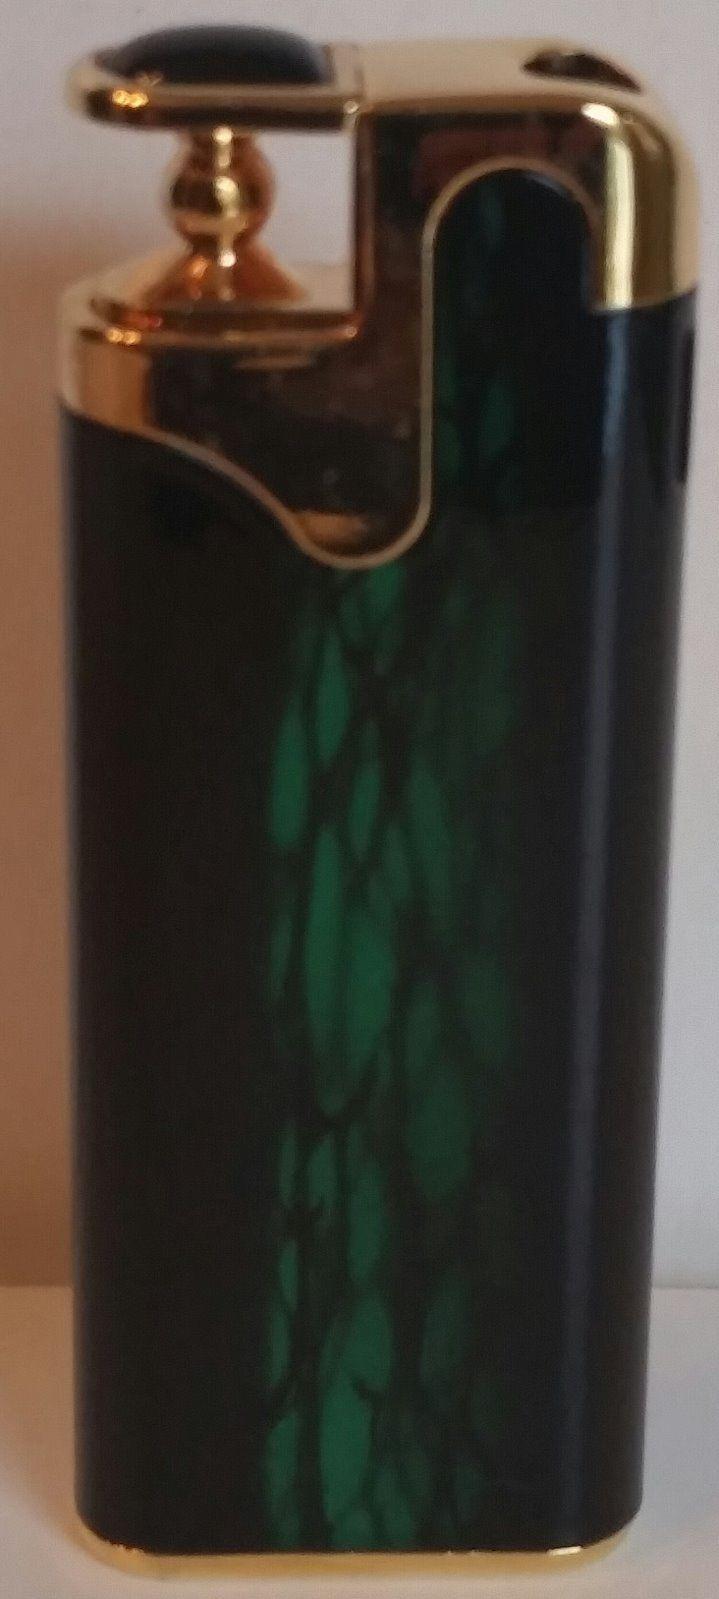 Refillable Salem Cigarette Butane Lighter Great Find In Package Gold Tone NEW Lighters